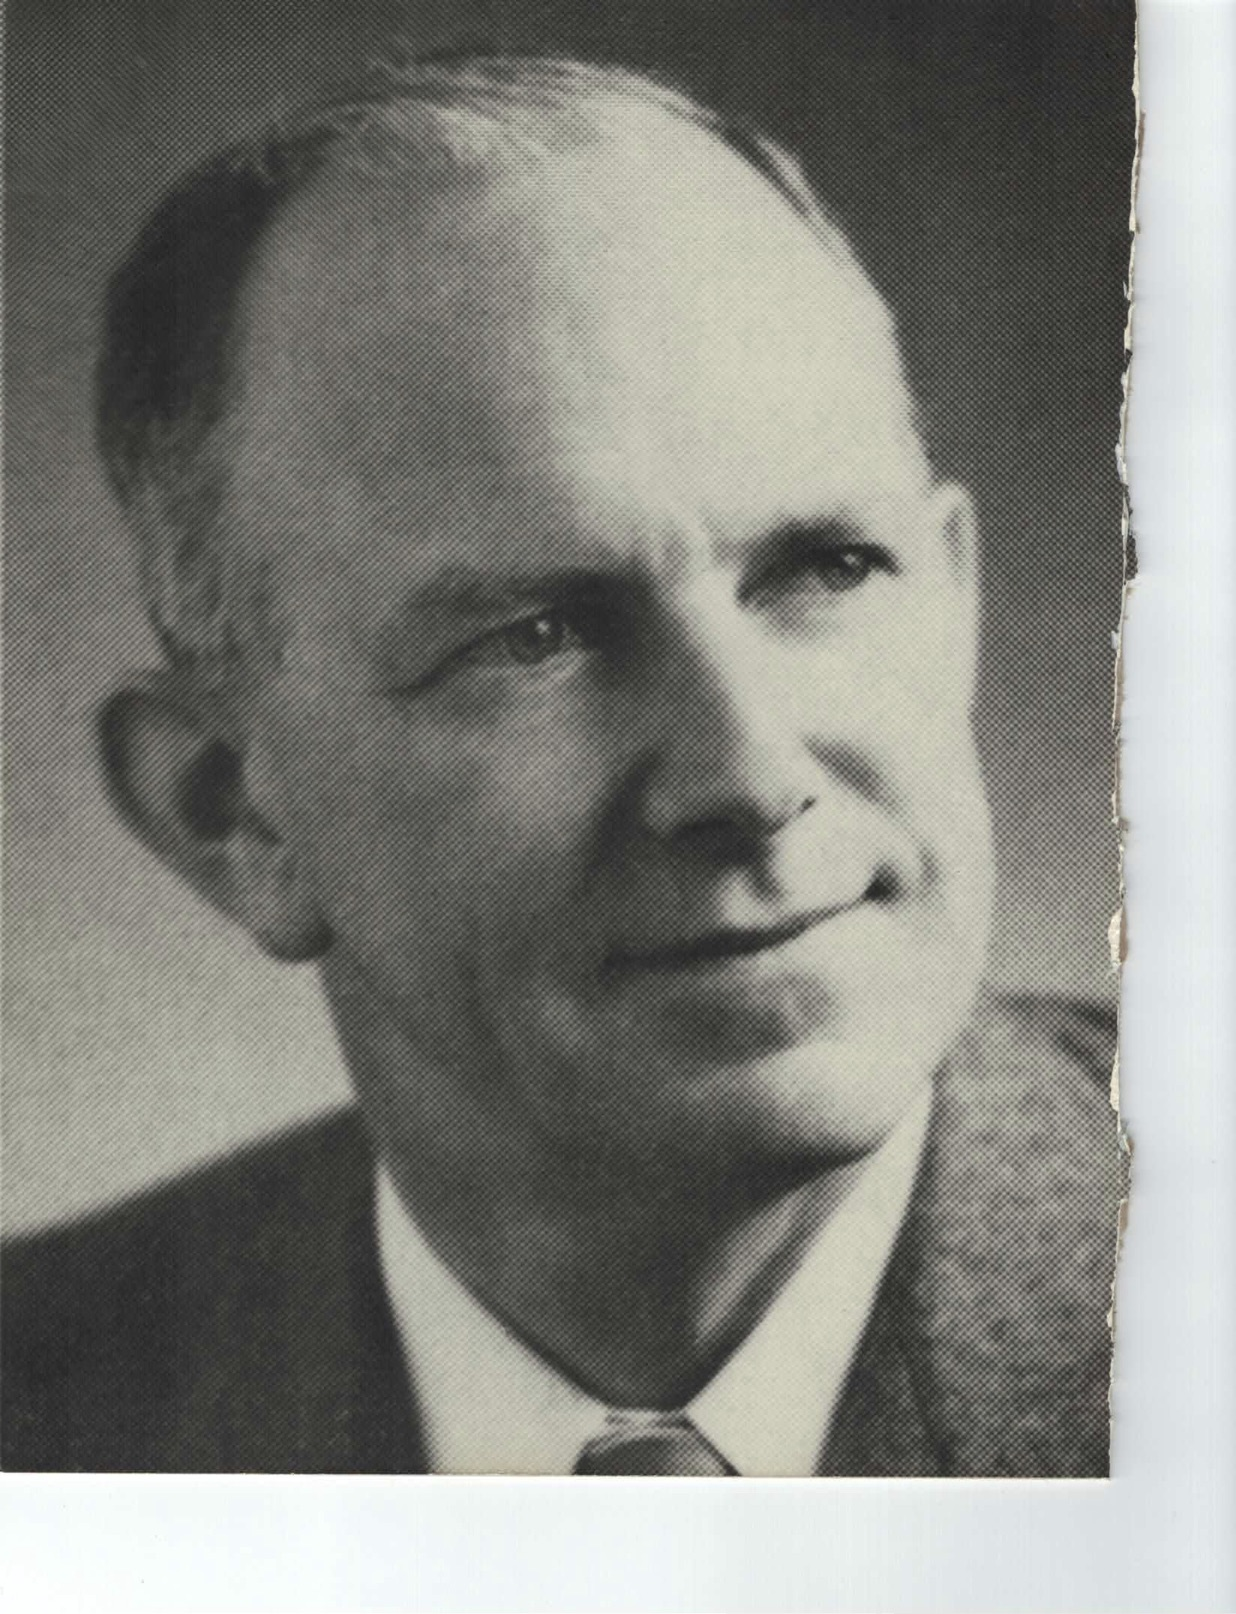 DOUGLAS STANSBERY 1952-53